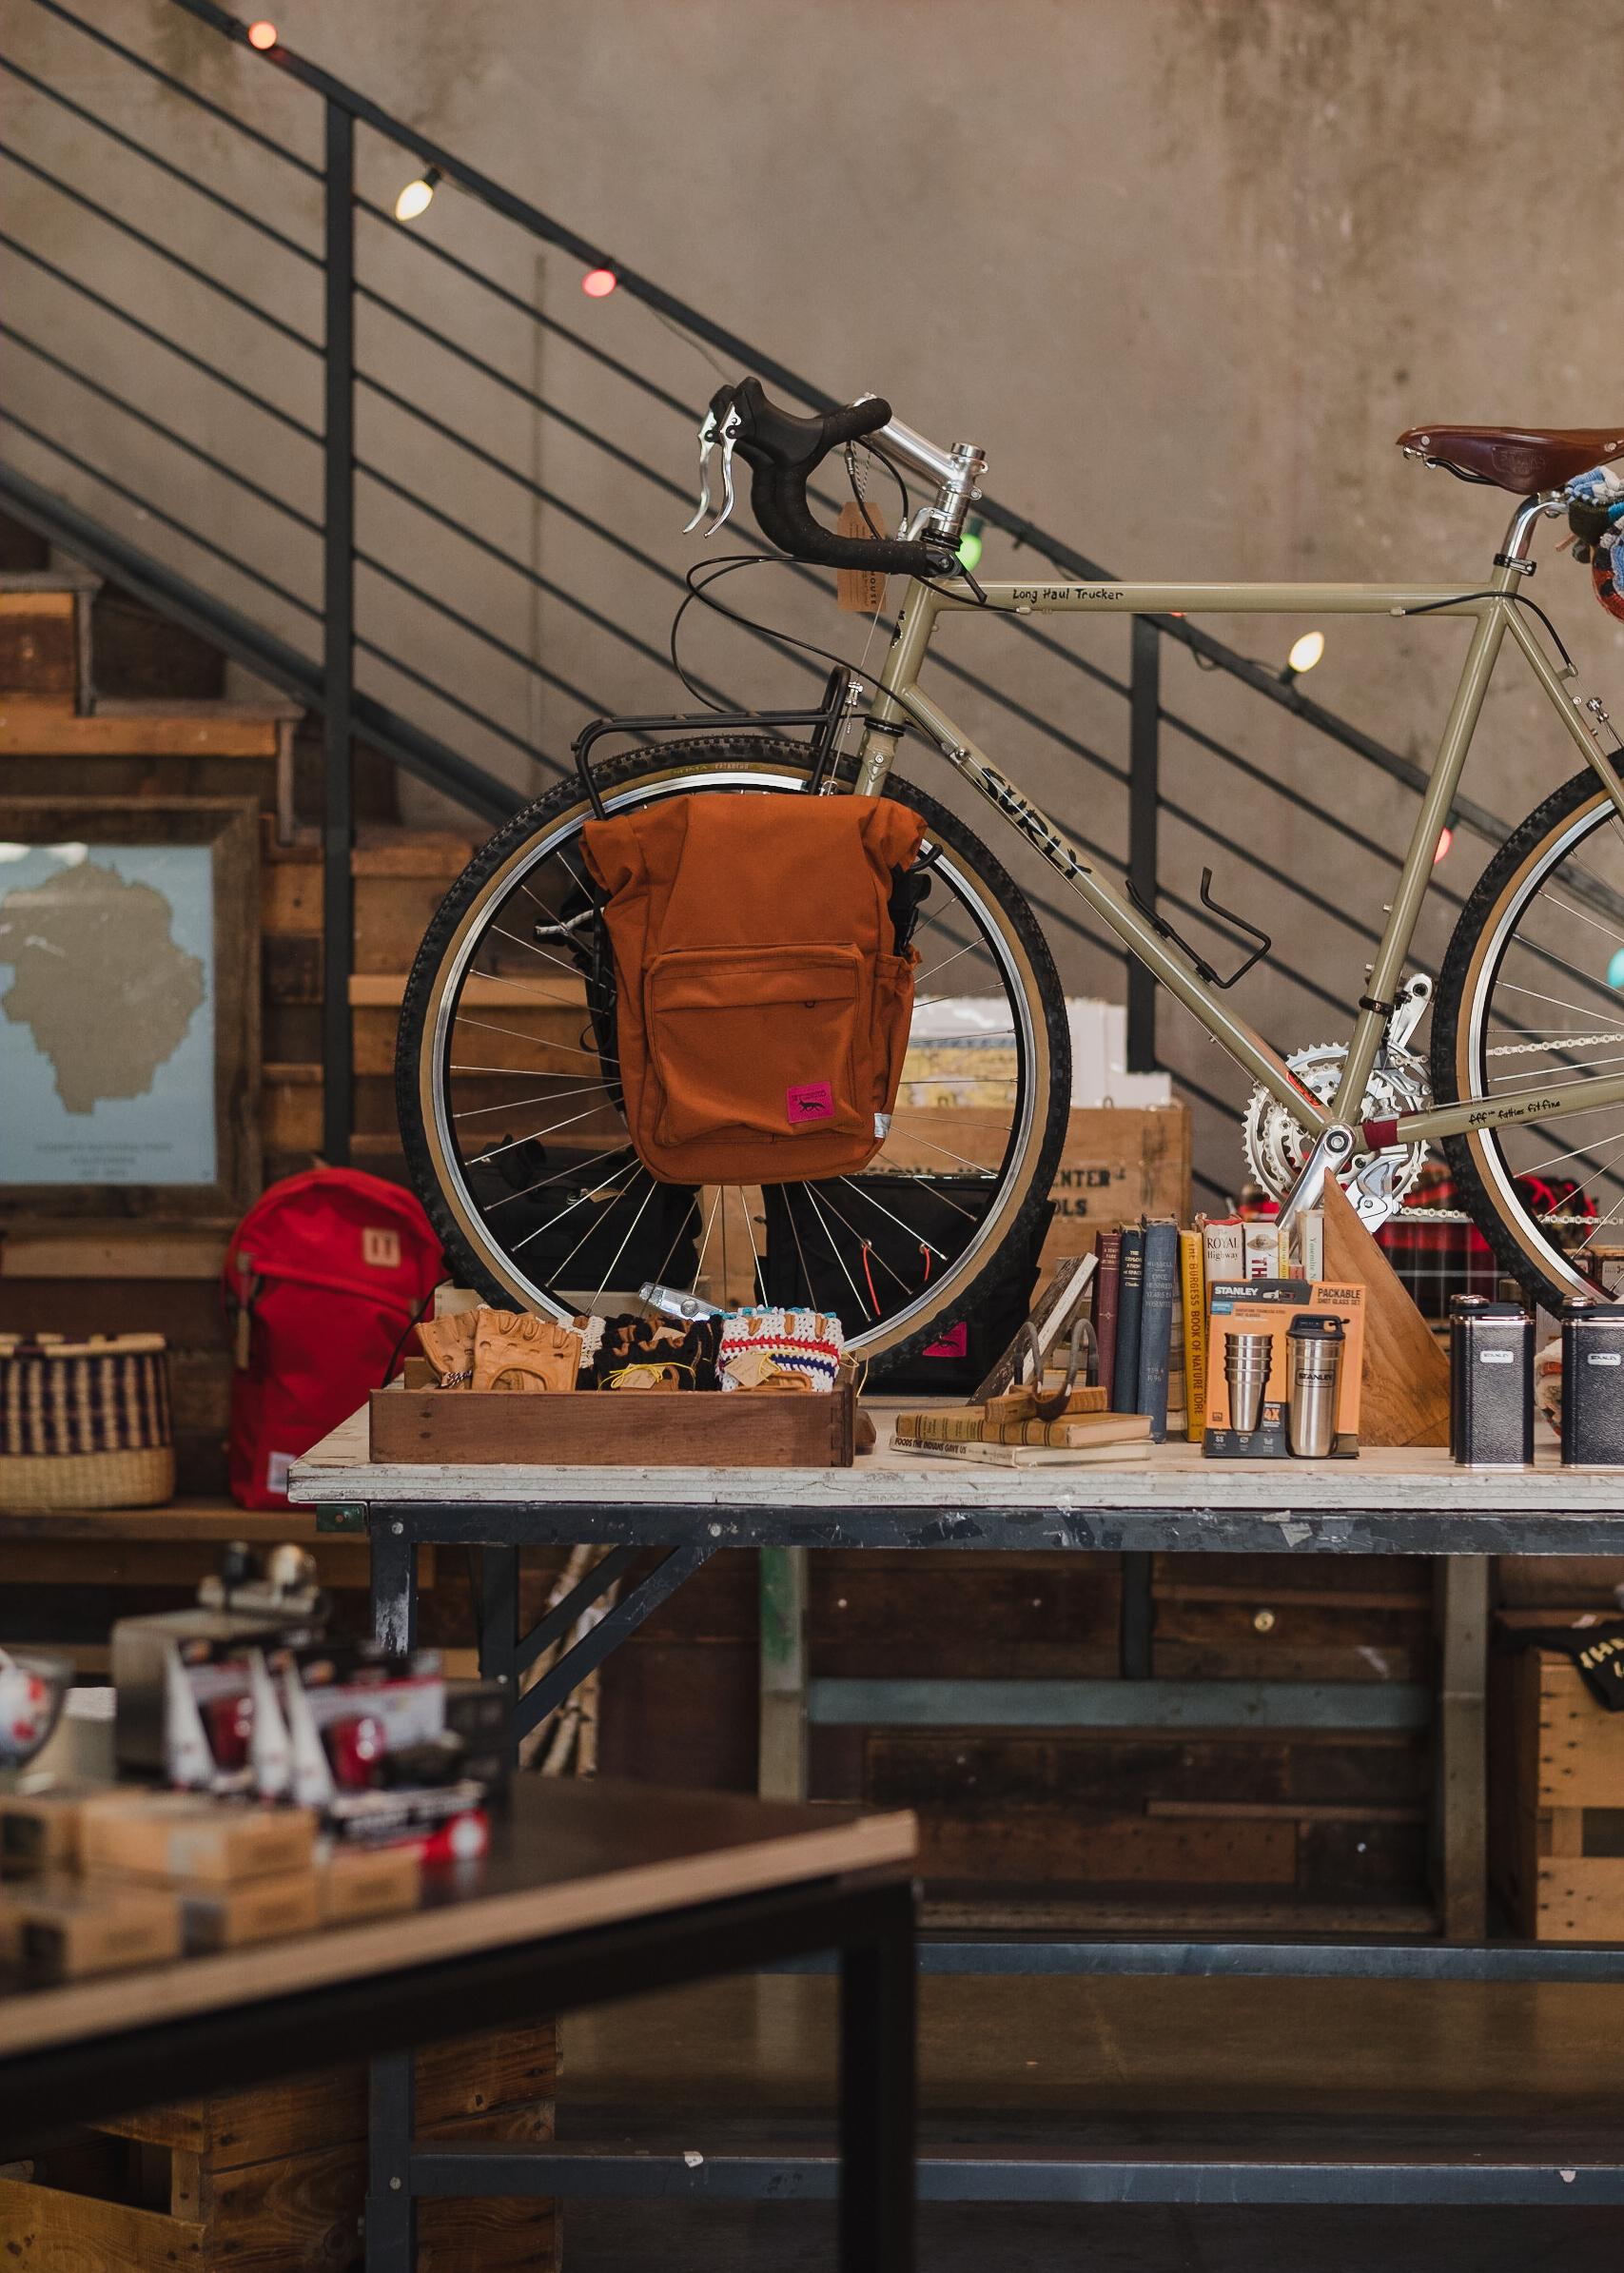 bike-cafe-LA-7939.jpg